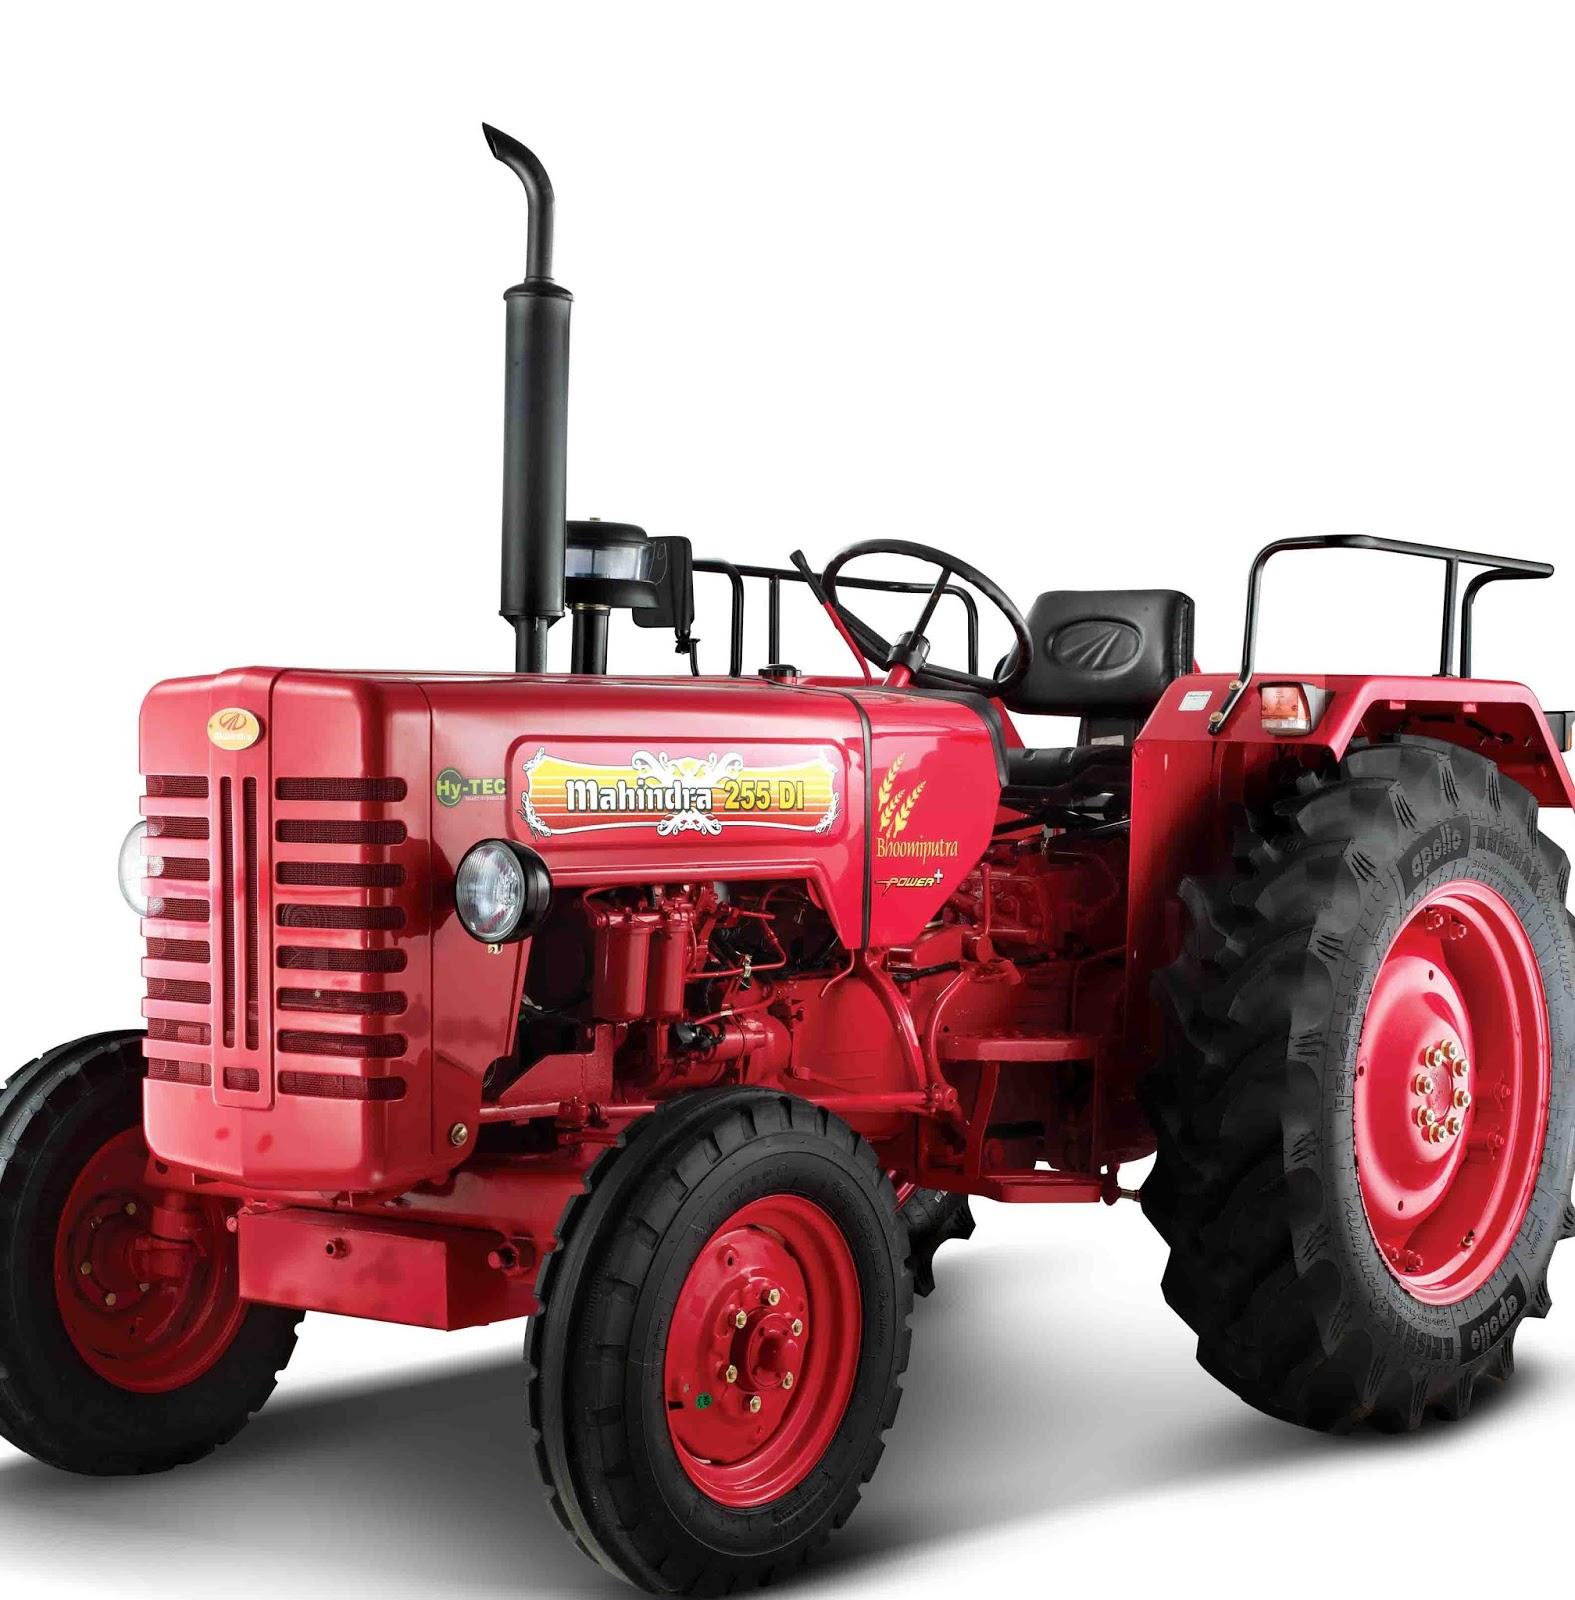 Mahindra 255 DI Power Plus Tractor, Price in India ...